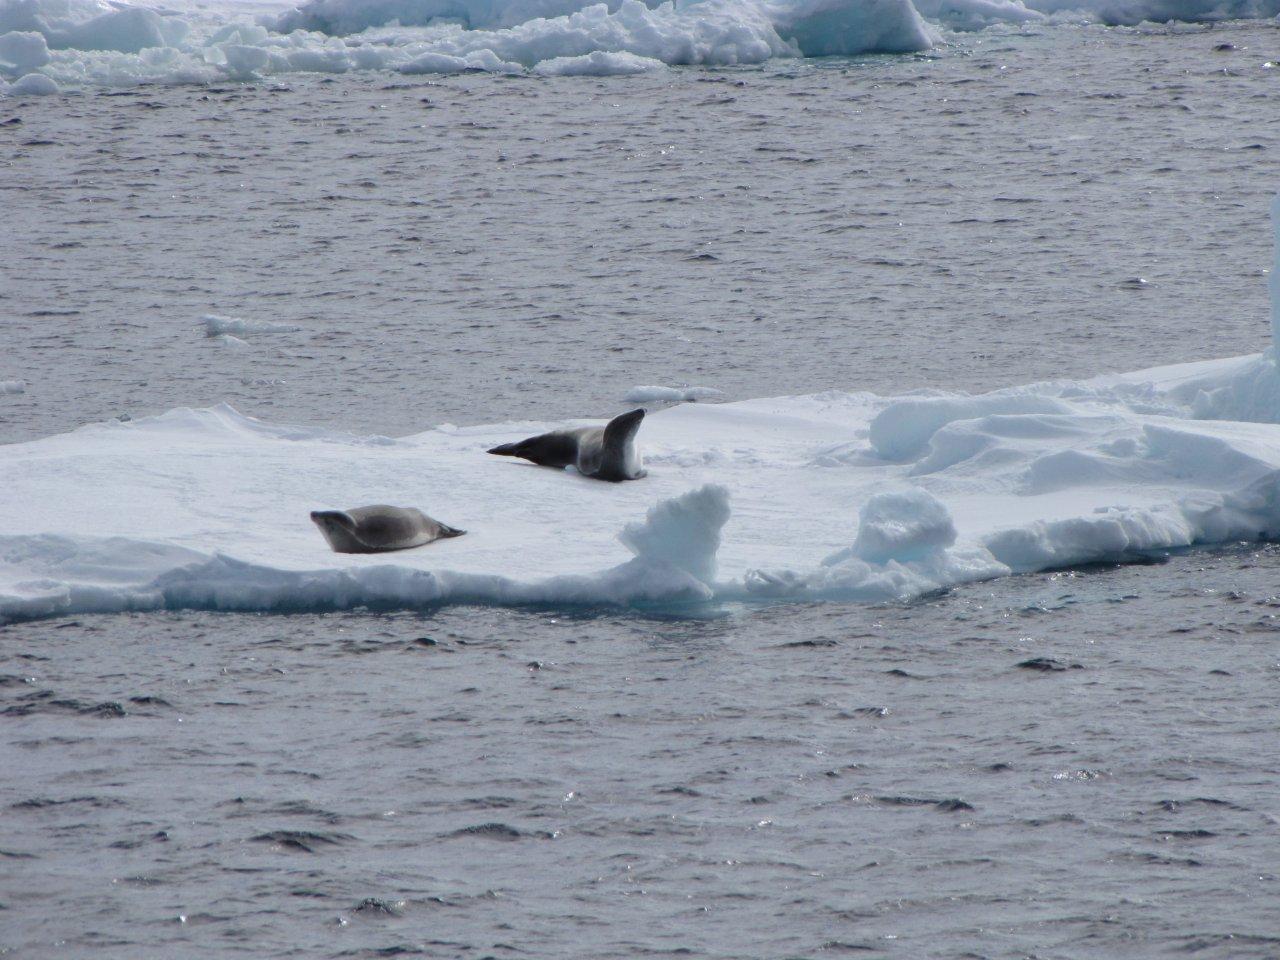 Ice shelves, icebergs and sea ice in Antarctica